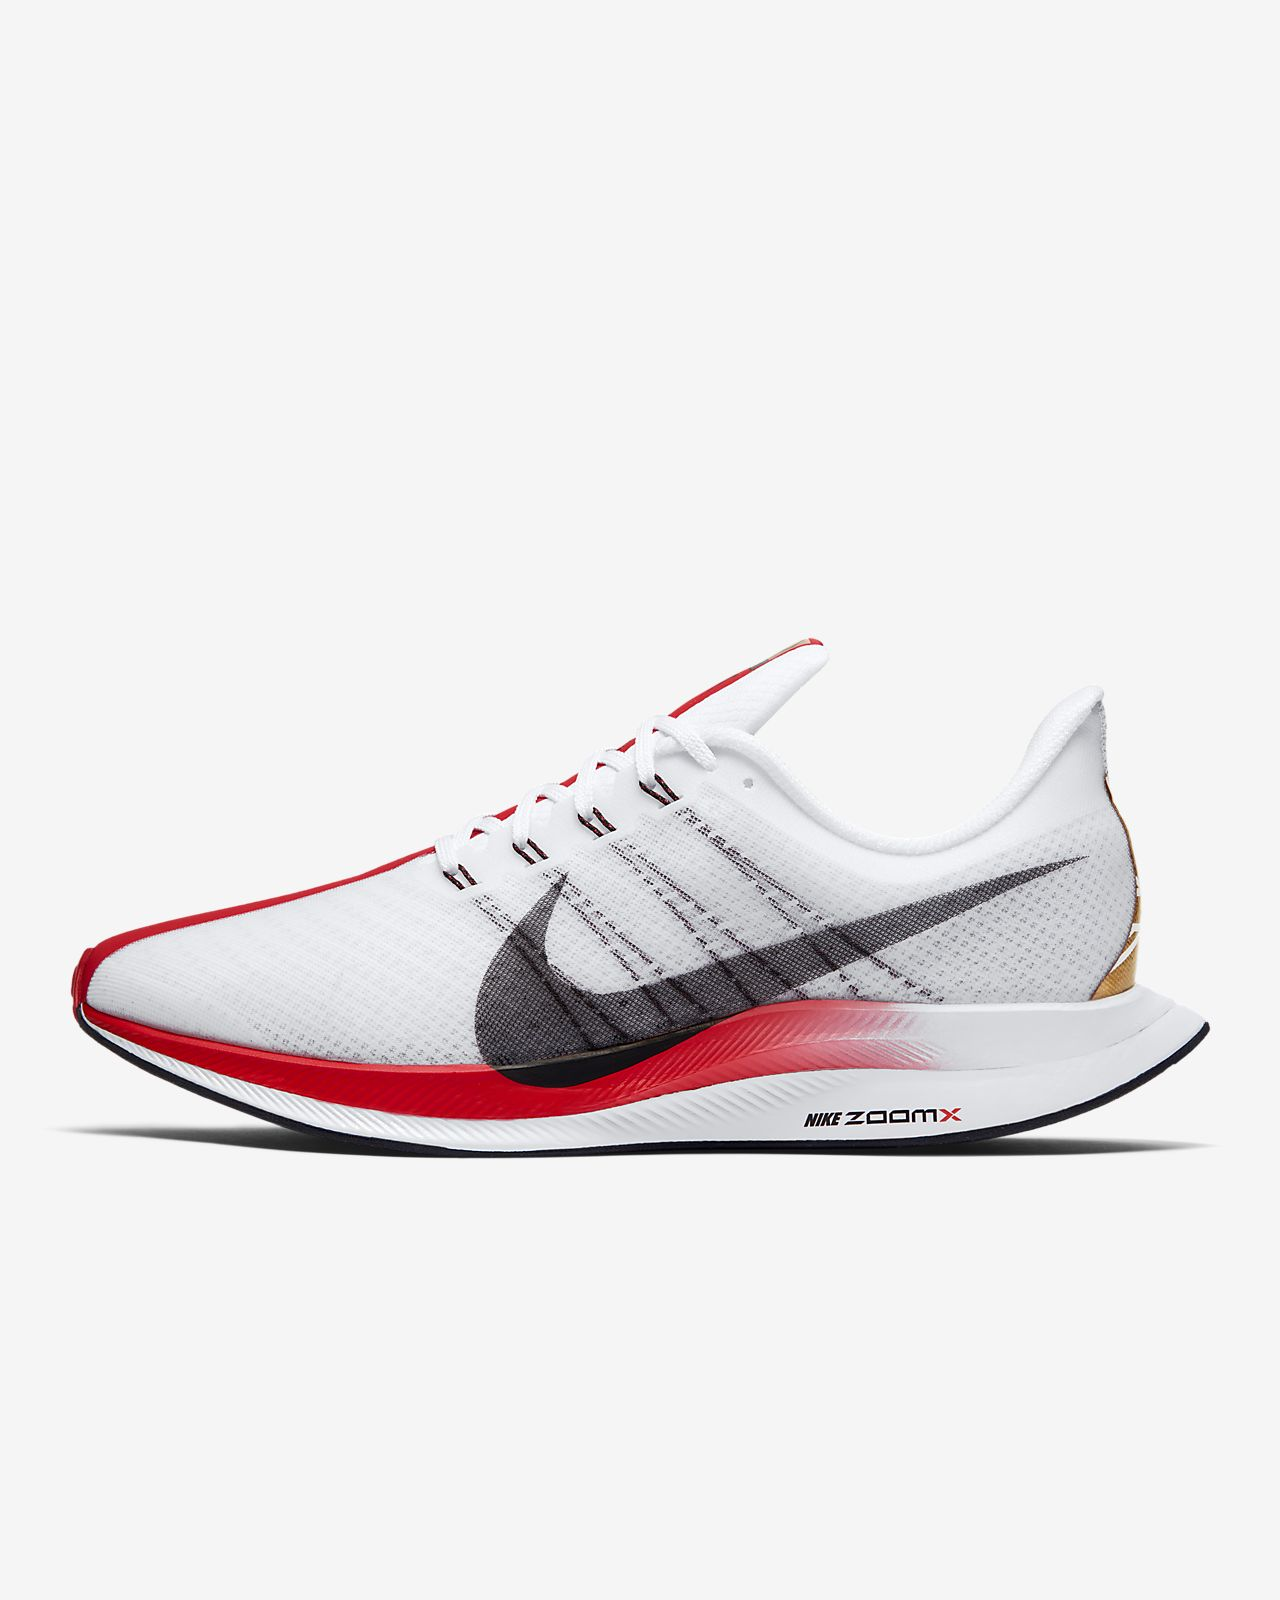 6ec07859f1770 Nike Zoom Pegasus 35 Turbo Mo Running Shoe. Nike.com AU